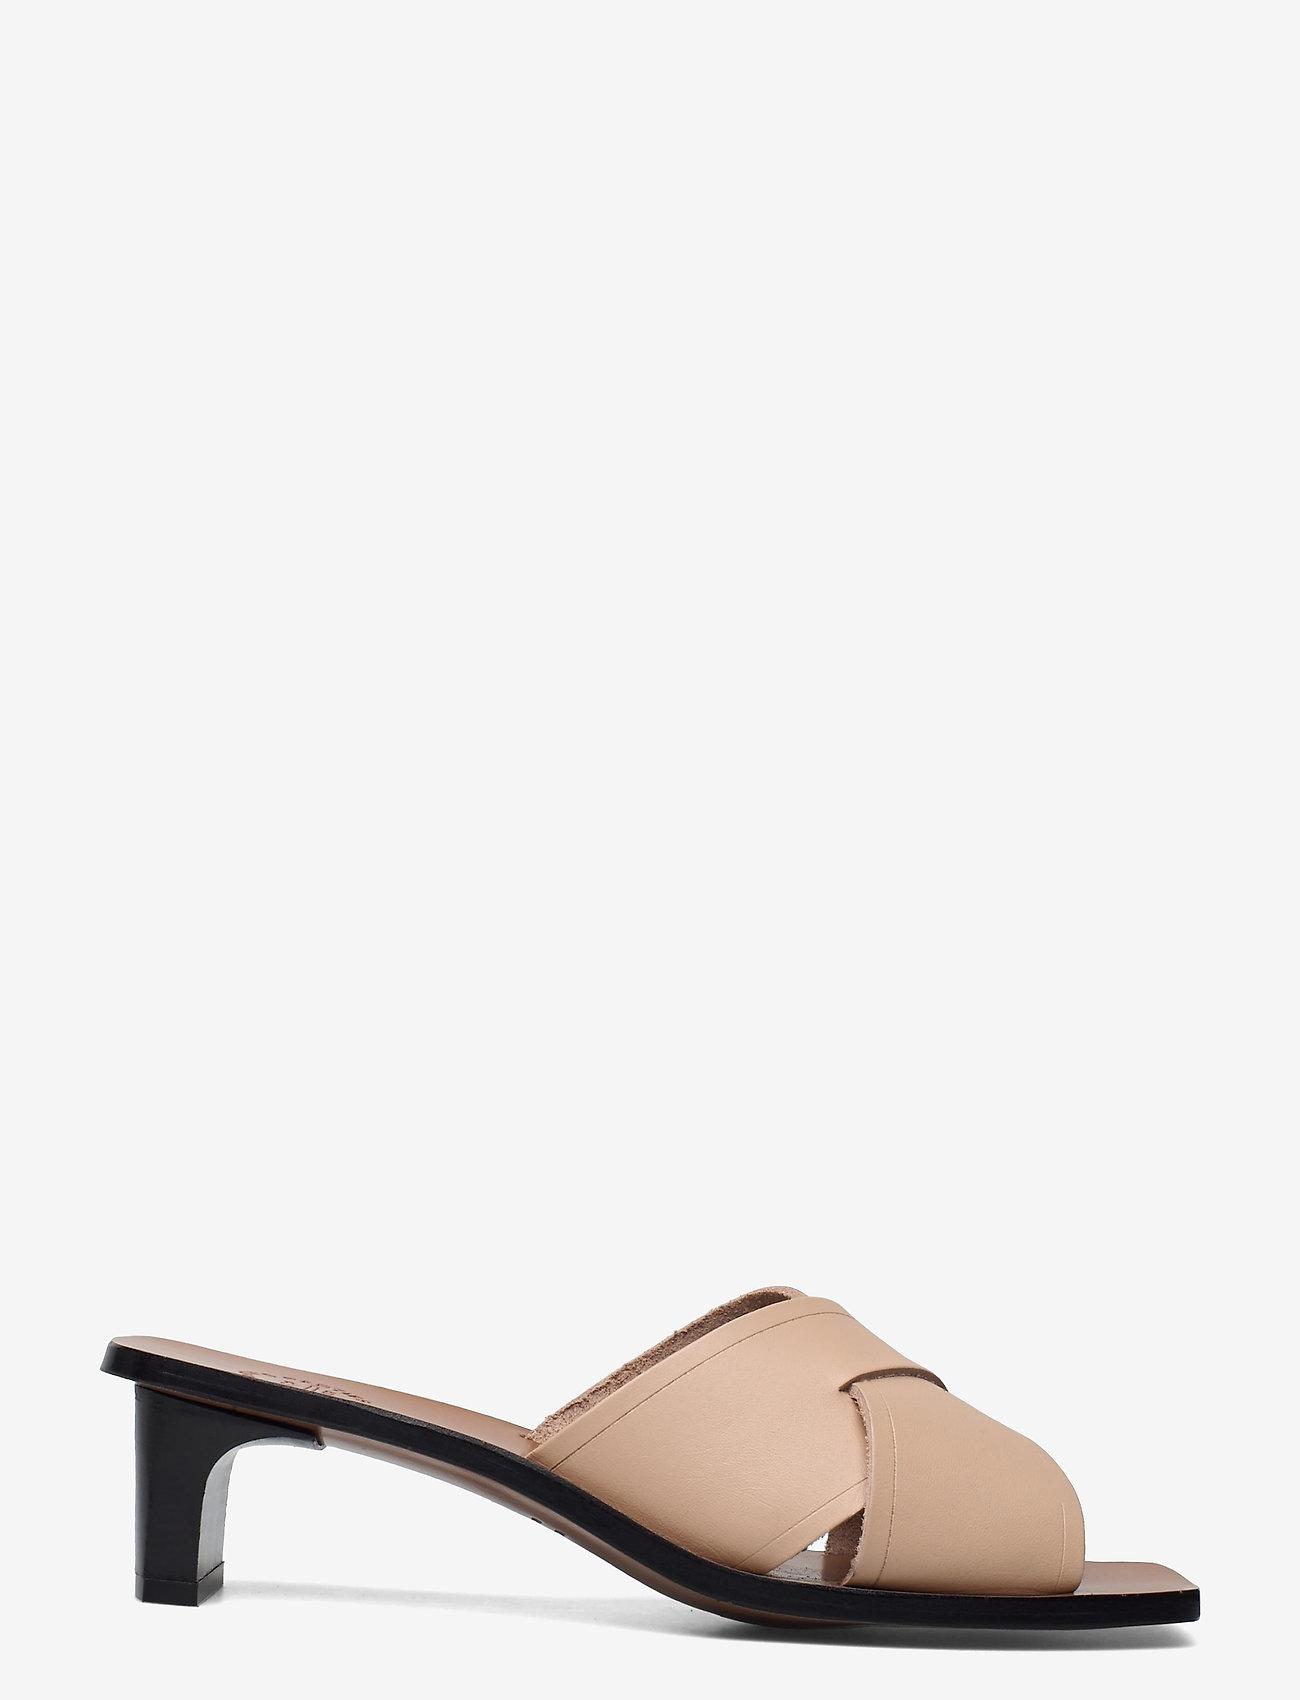 ATP Atelier - Stornarella Sand Vacchetta - heeled sandals - sand - 1